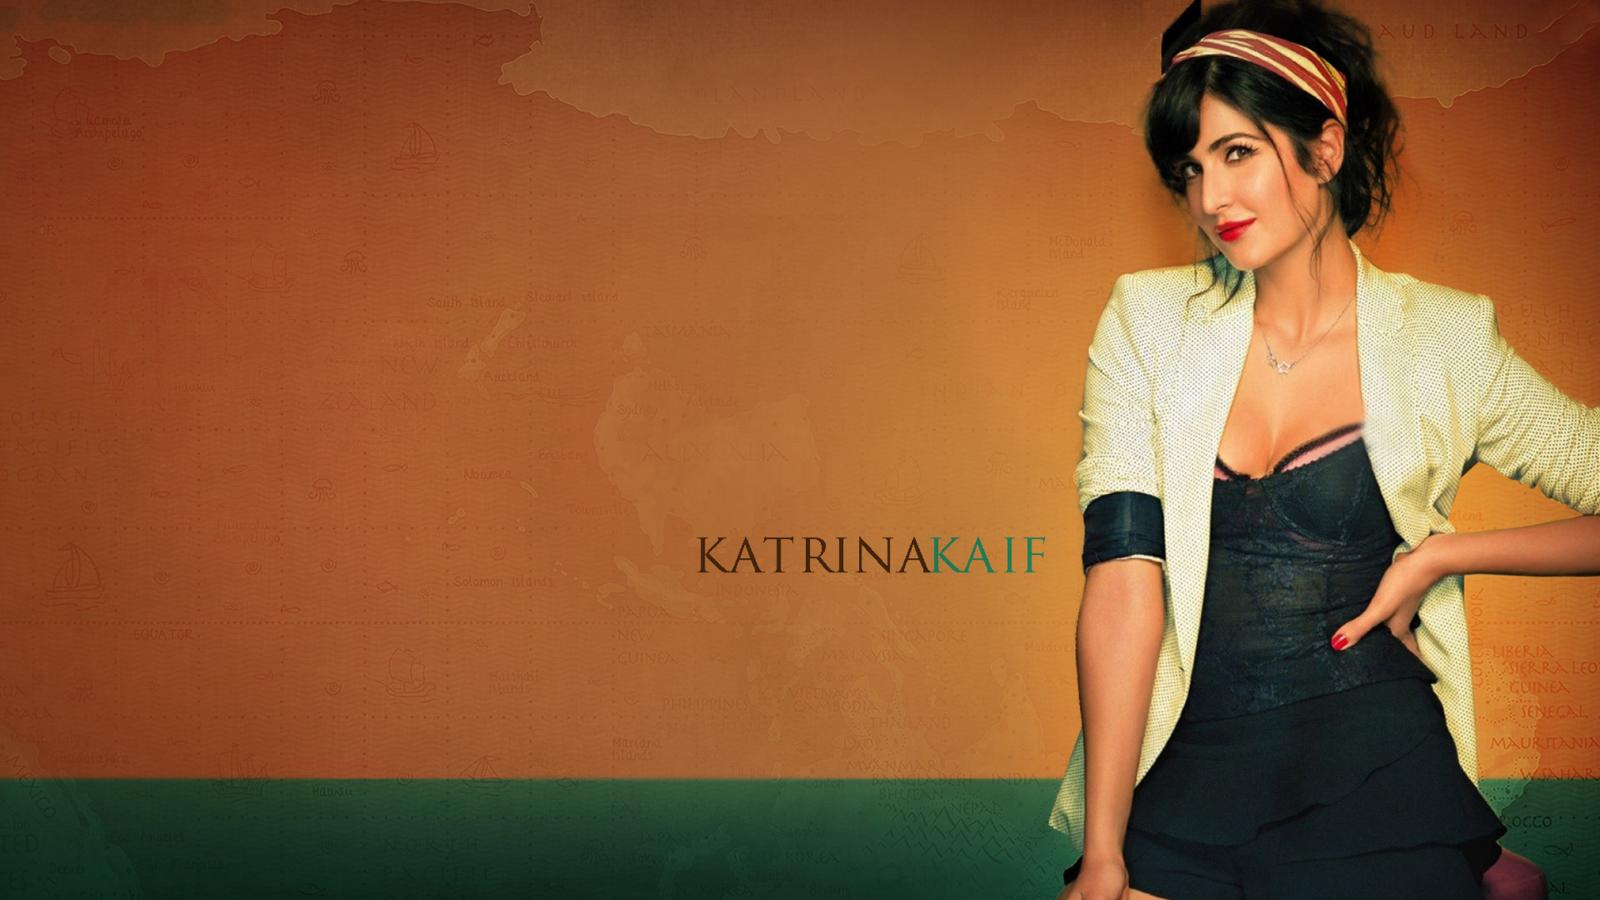 Katrina Kaif Hd Wallpapers 1600x900